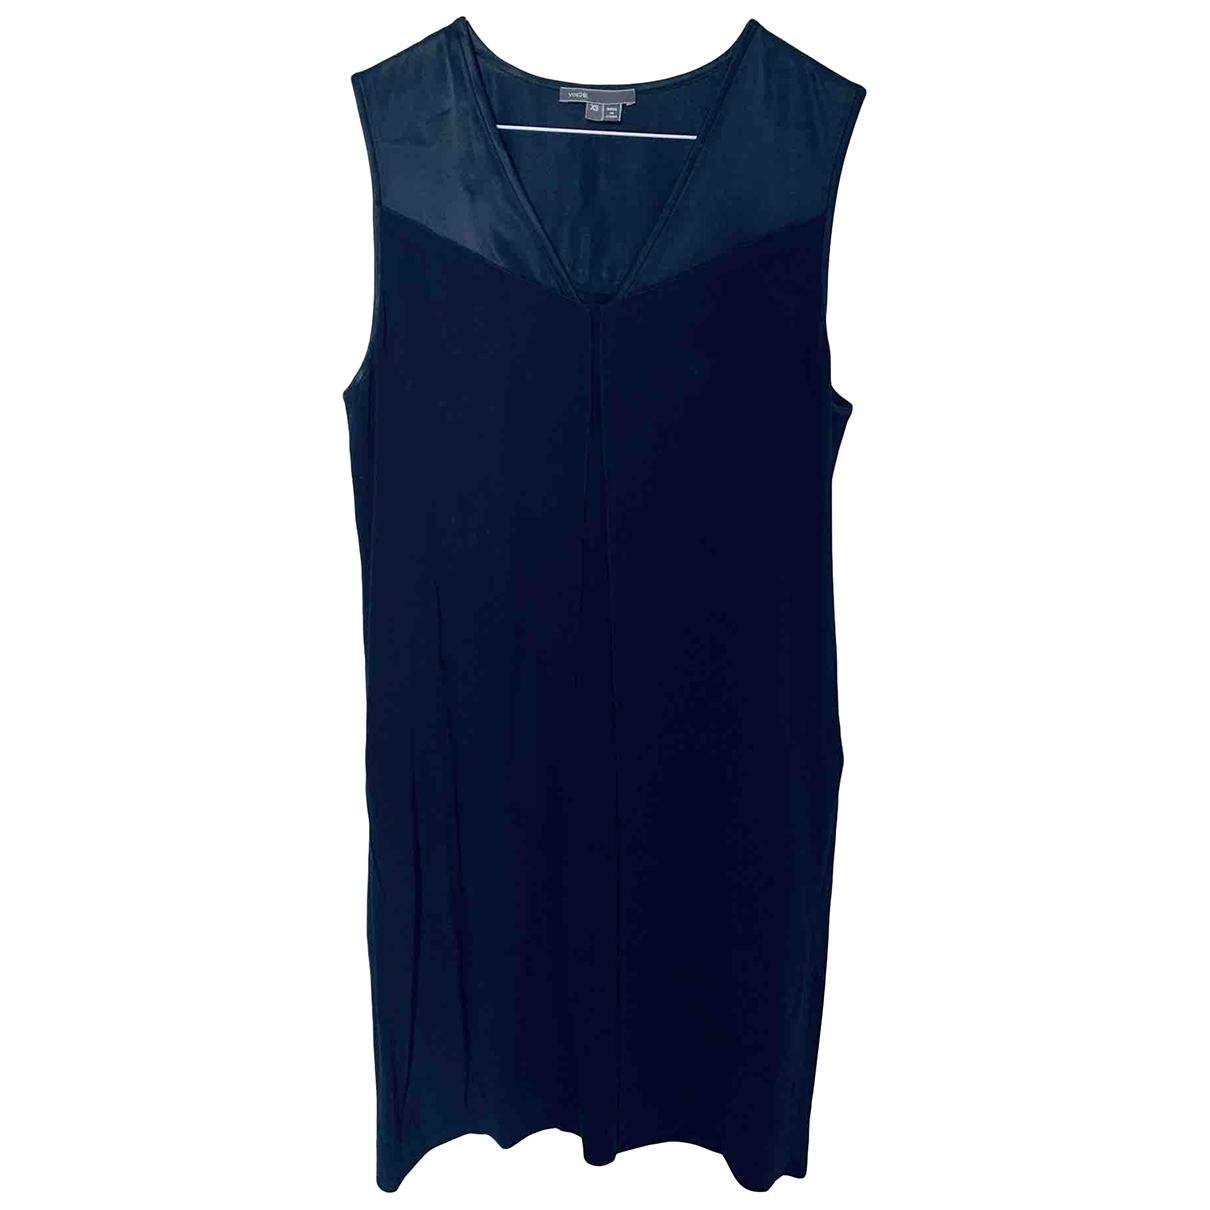 Vince \N Navy dress for Women XS International